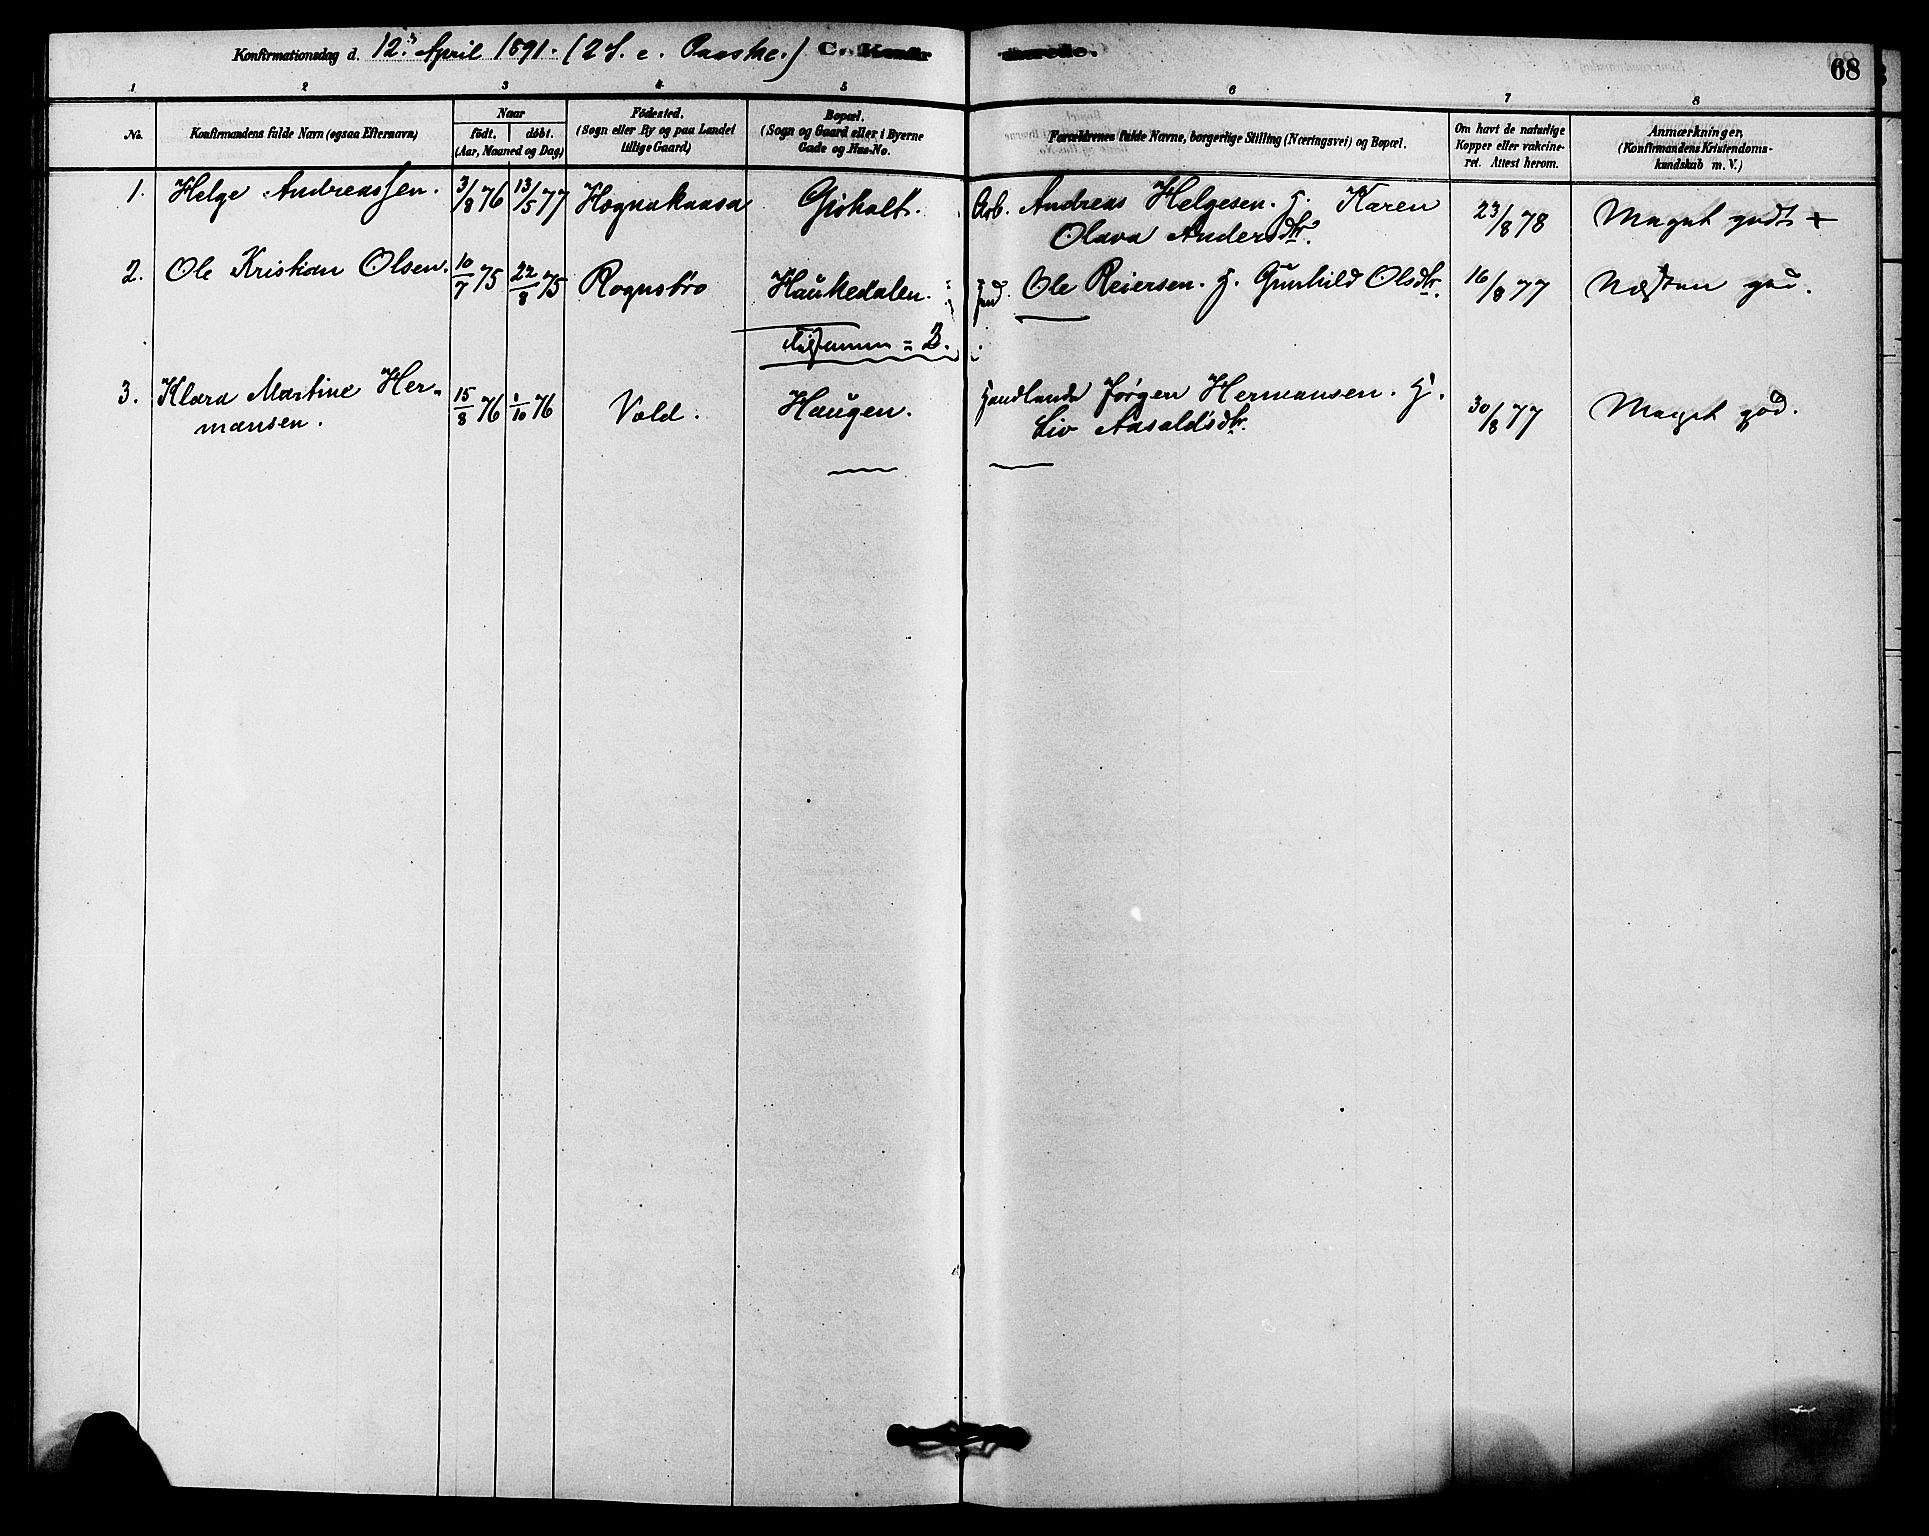 SAKO, Solum kirkebøker, F/Fc/L0001: Ministerialbok nr. III 1, 1877-1891, s. 68